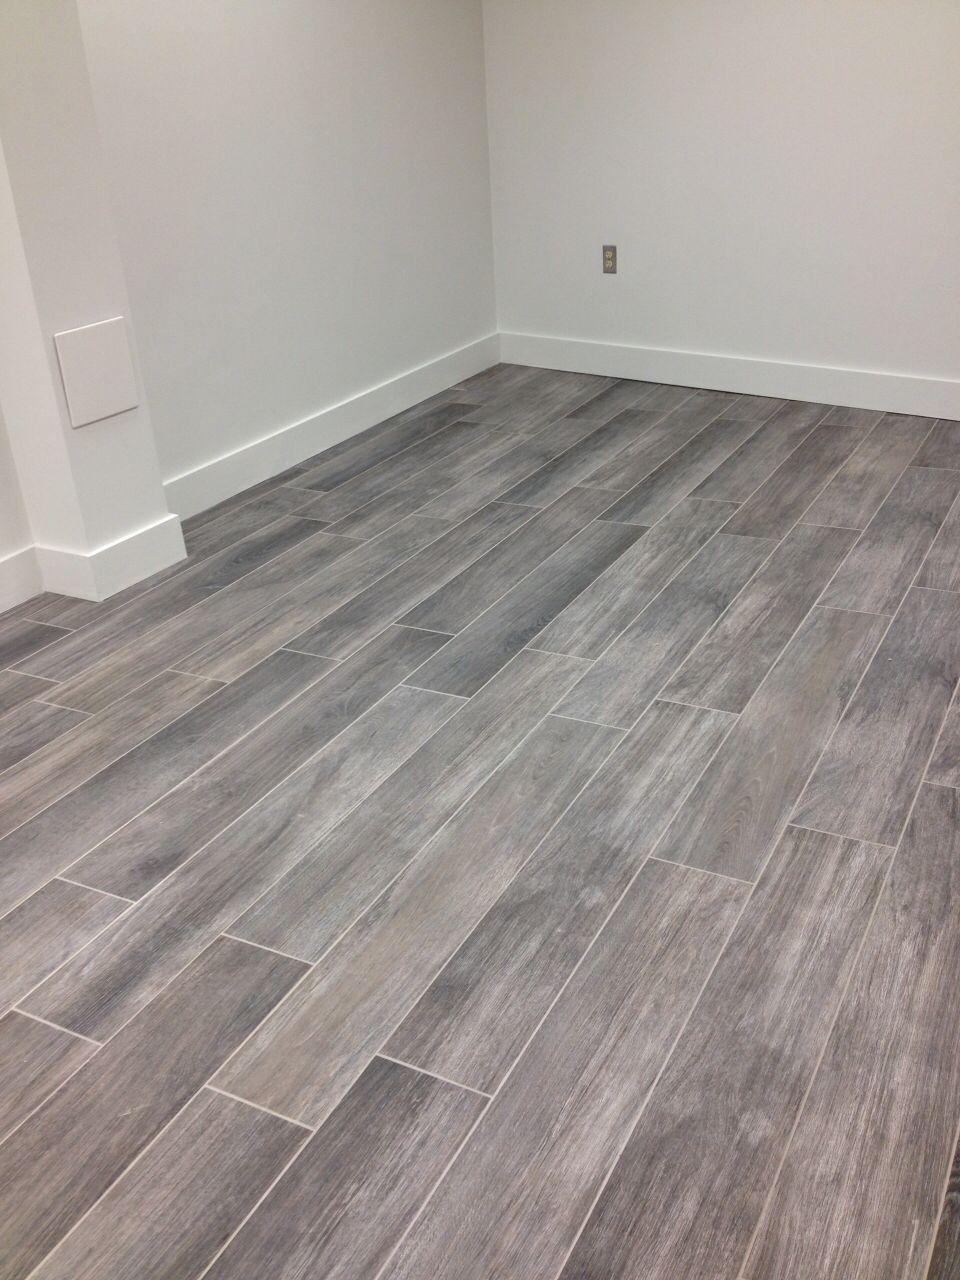 Porcelain grey wood tile Gray wood tile flooring, Grey